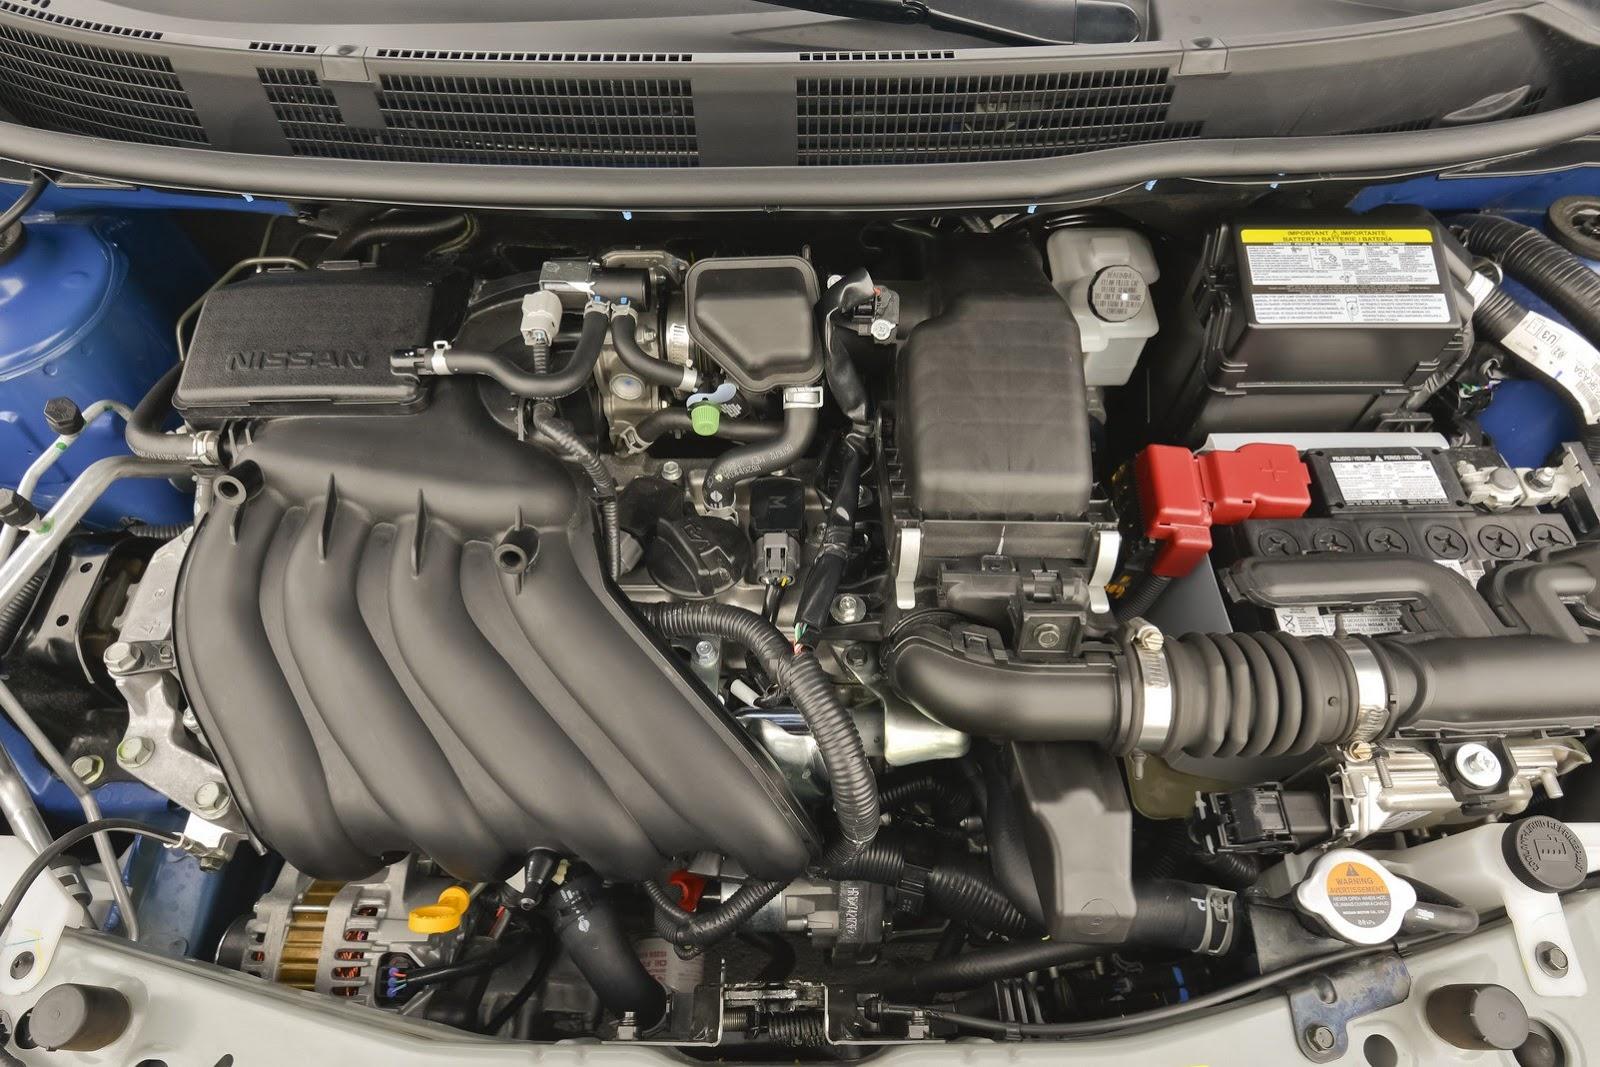 2013 Nissan Juke Fuse Box Diagram 2014 Nissan Versa Details And Pricing Autoevolution